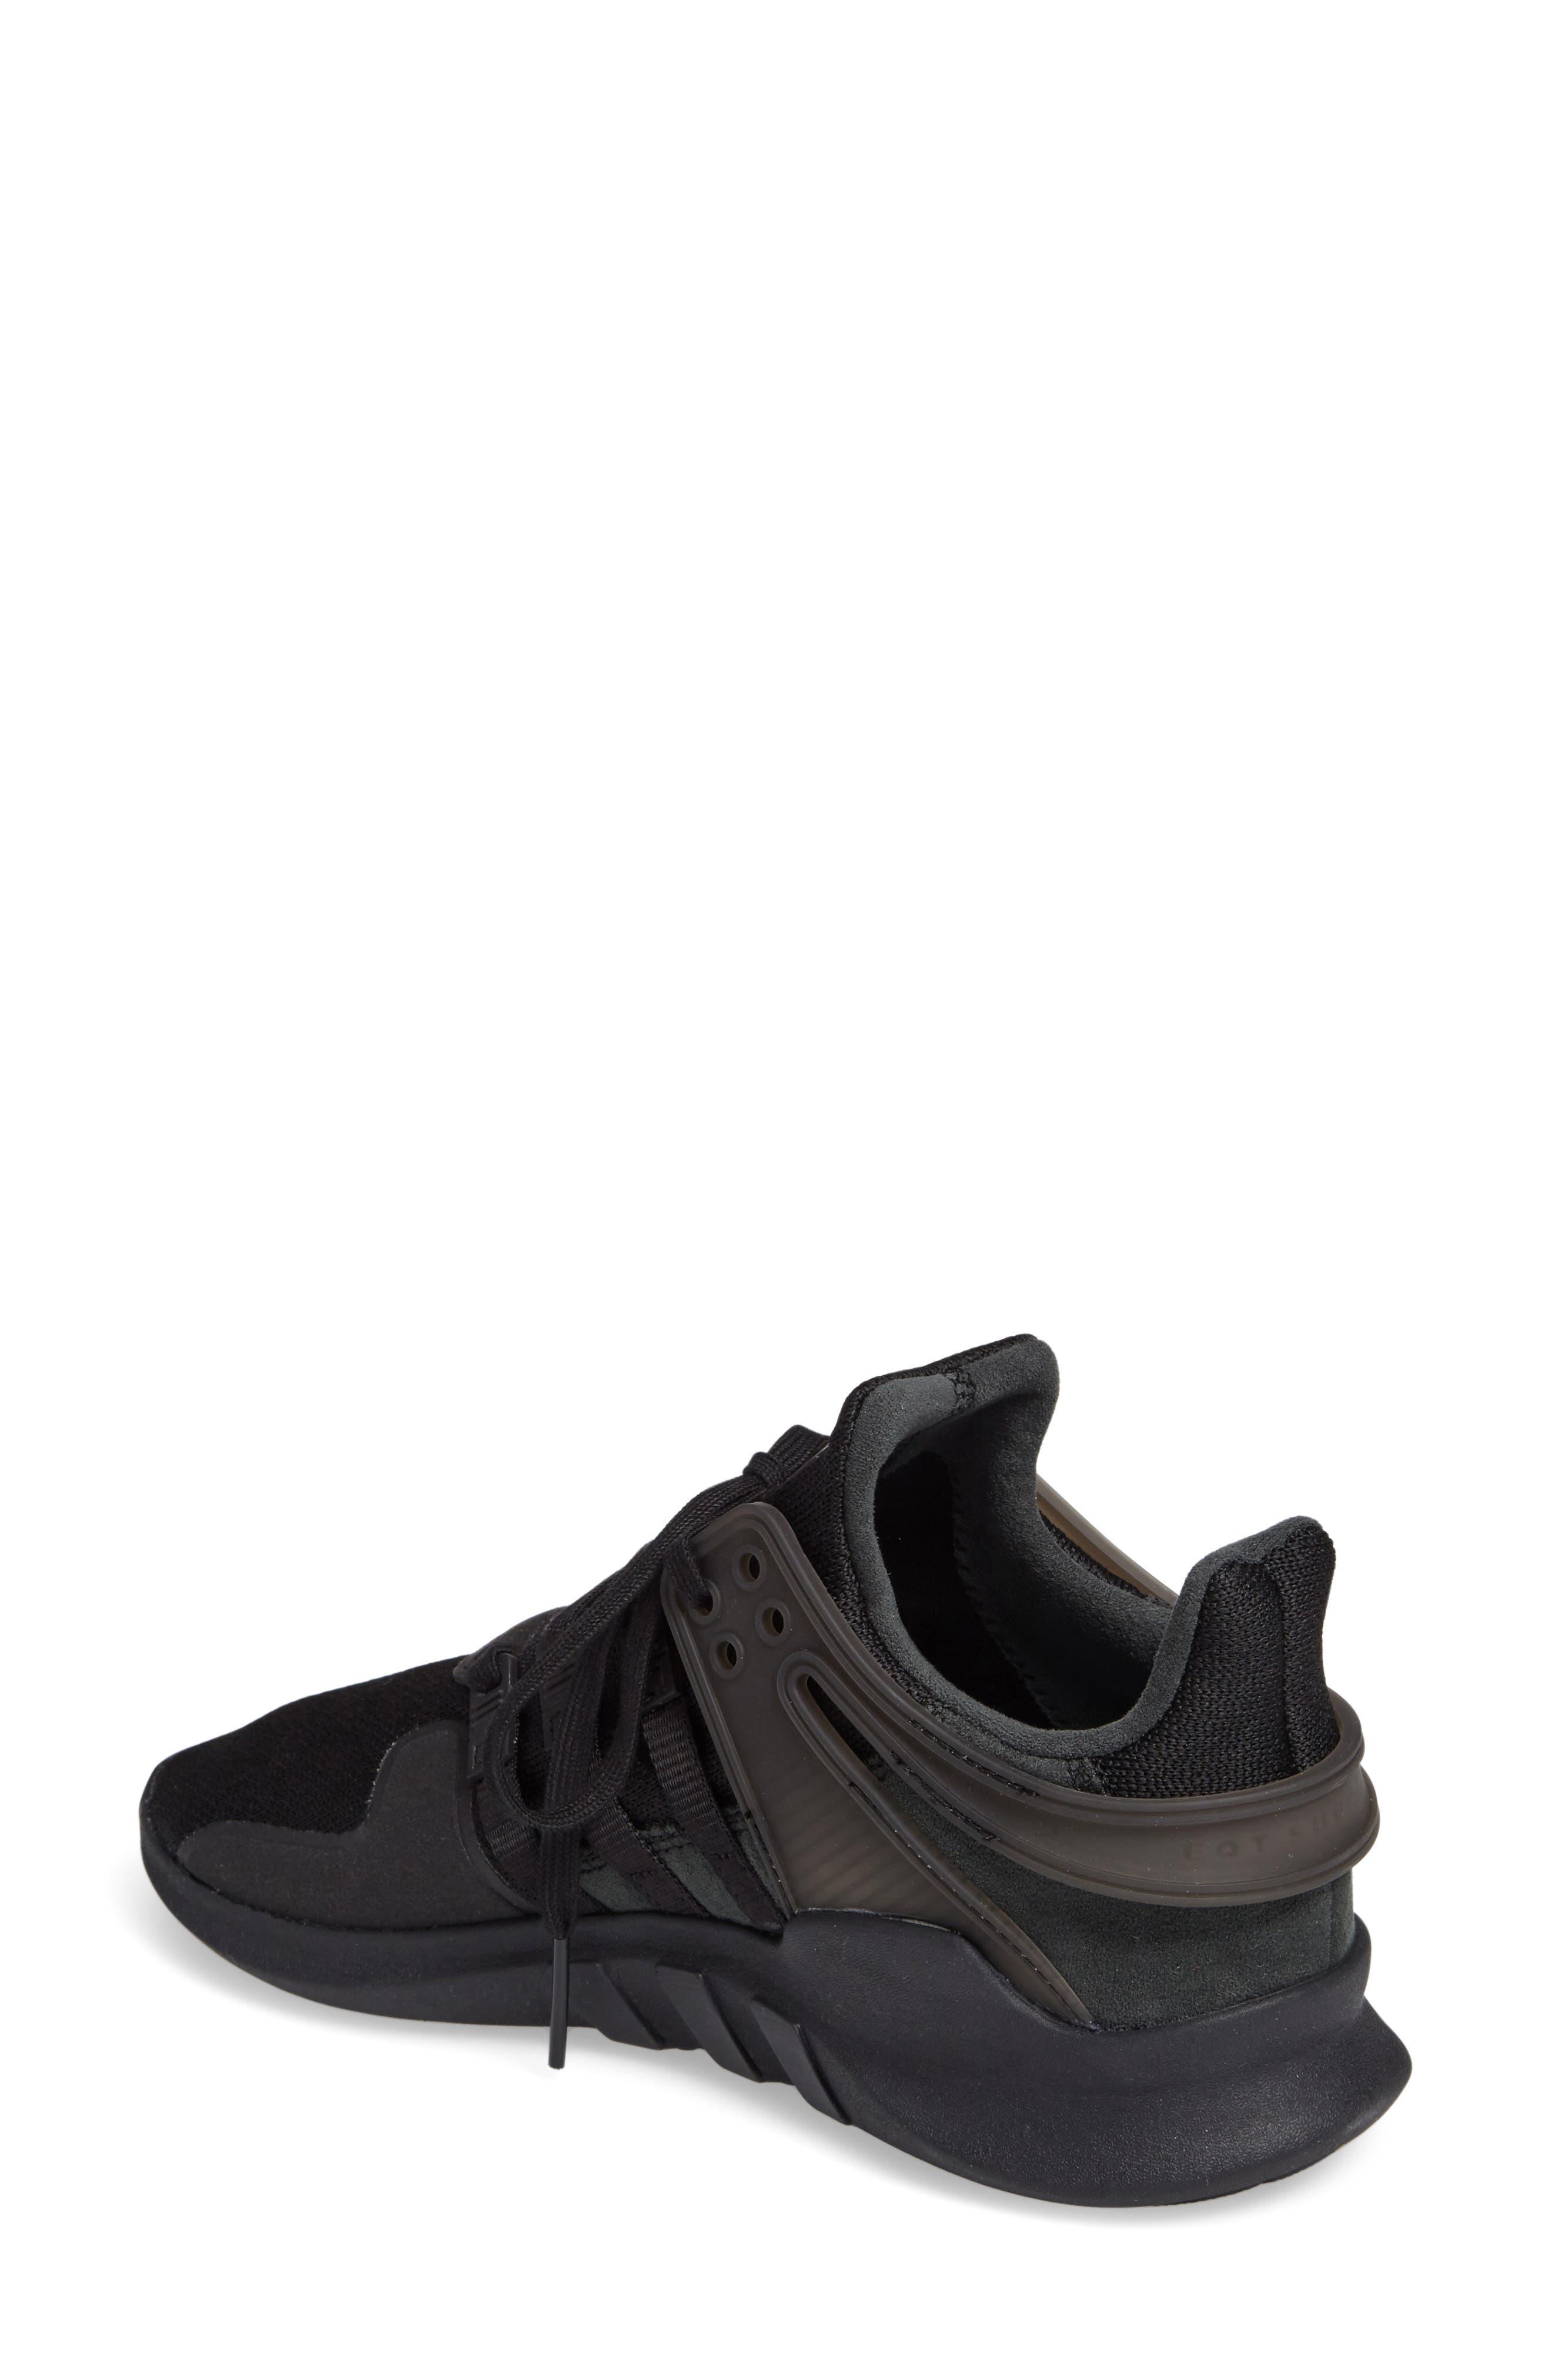 Alternate Image 2  - adidas Equipment Support ADV Sneaker (Toddler, Little Kid & Big Kid)